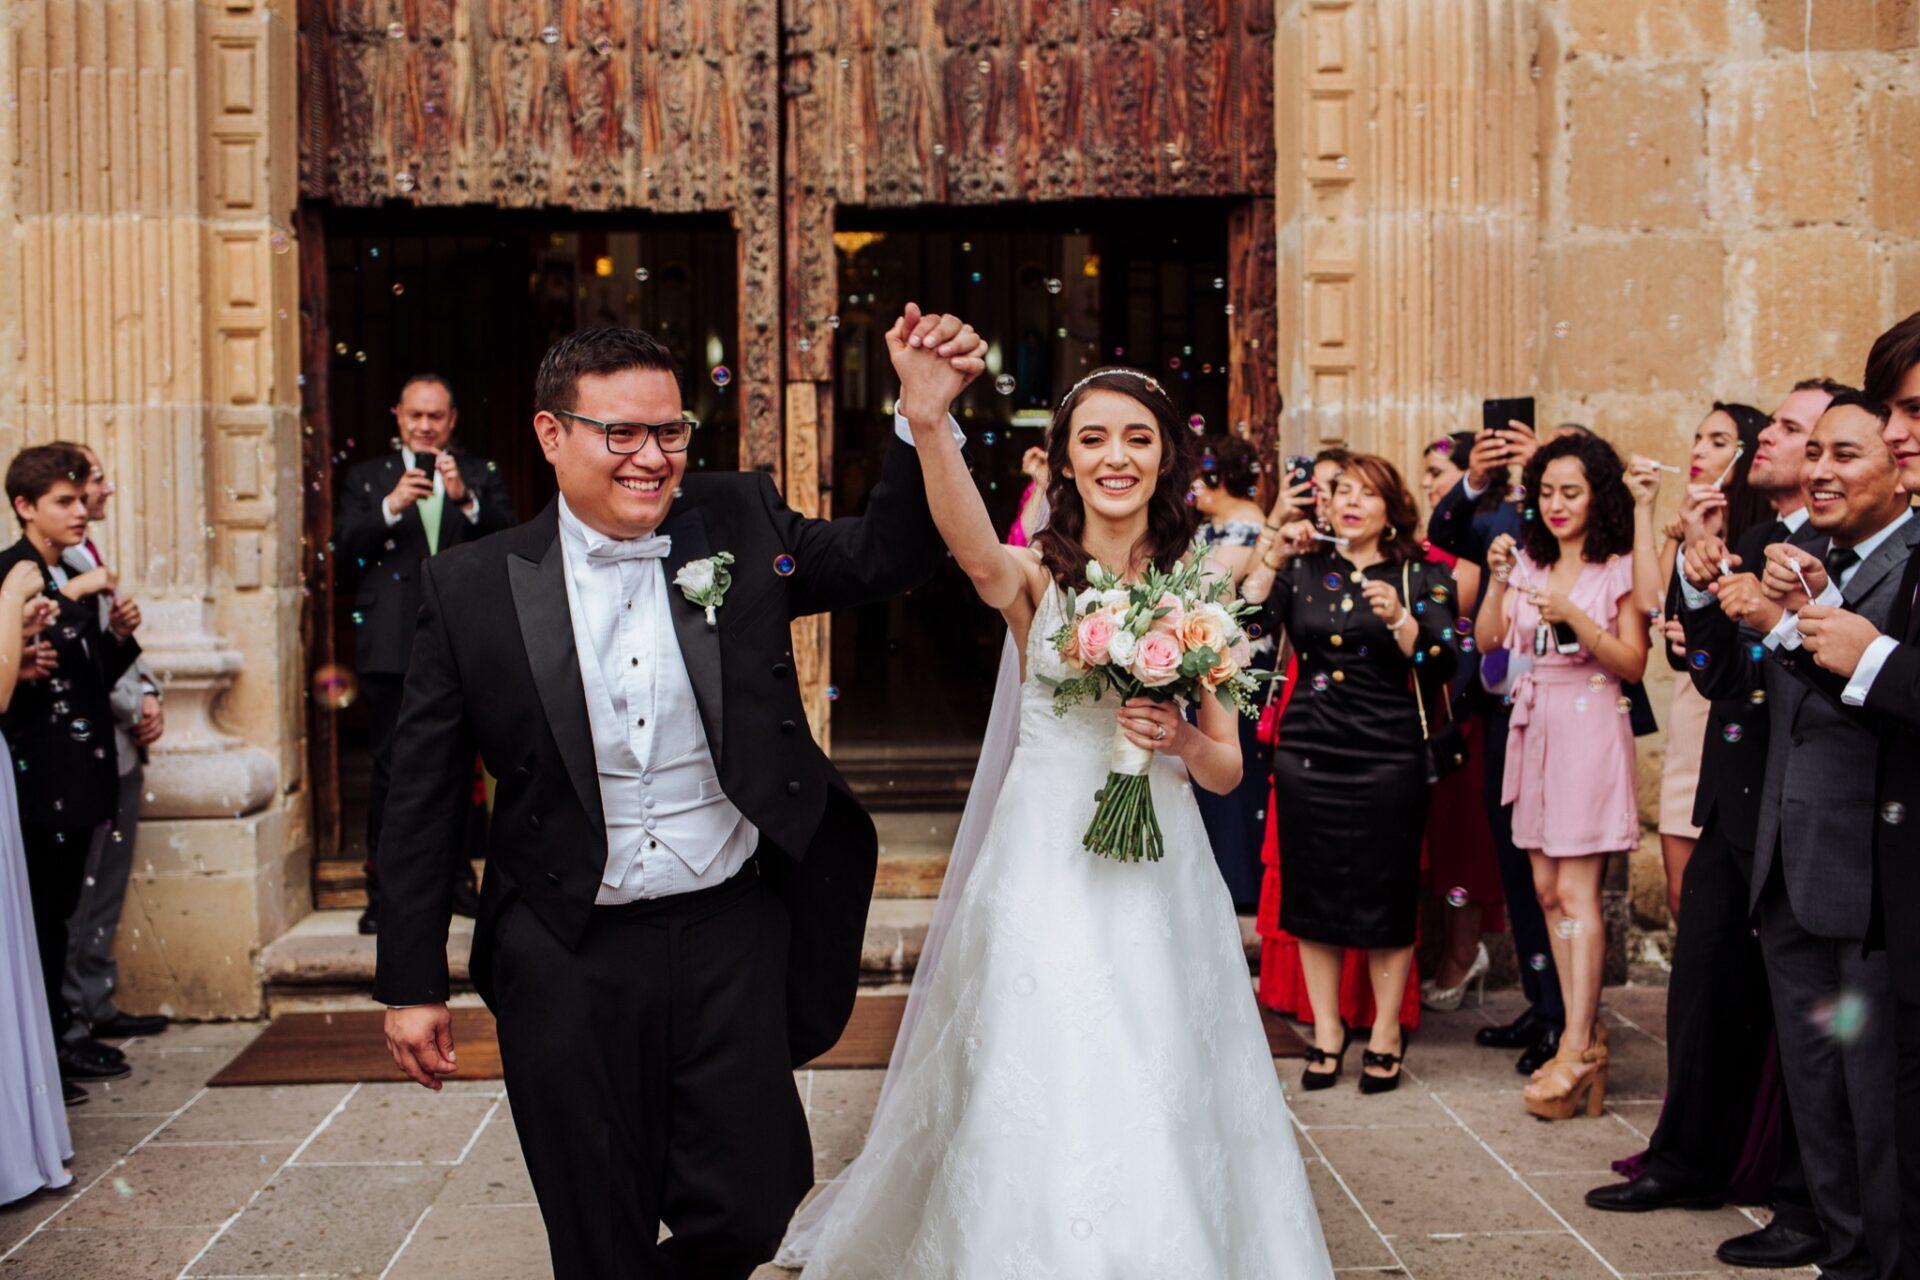 javier_noriega_fotografo_bodas_teul_zacatecas_wedding_photographer15a